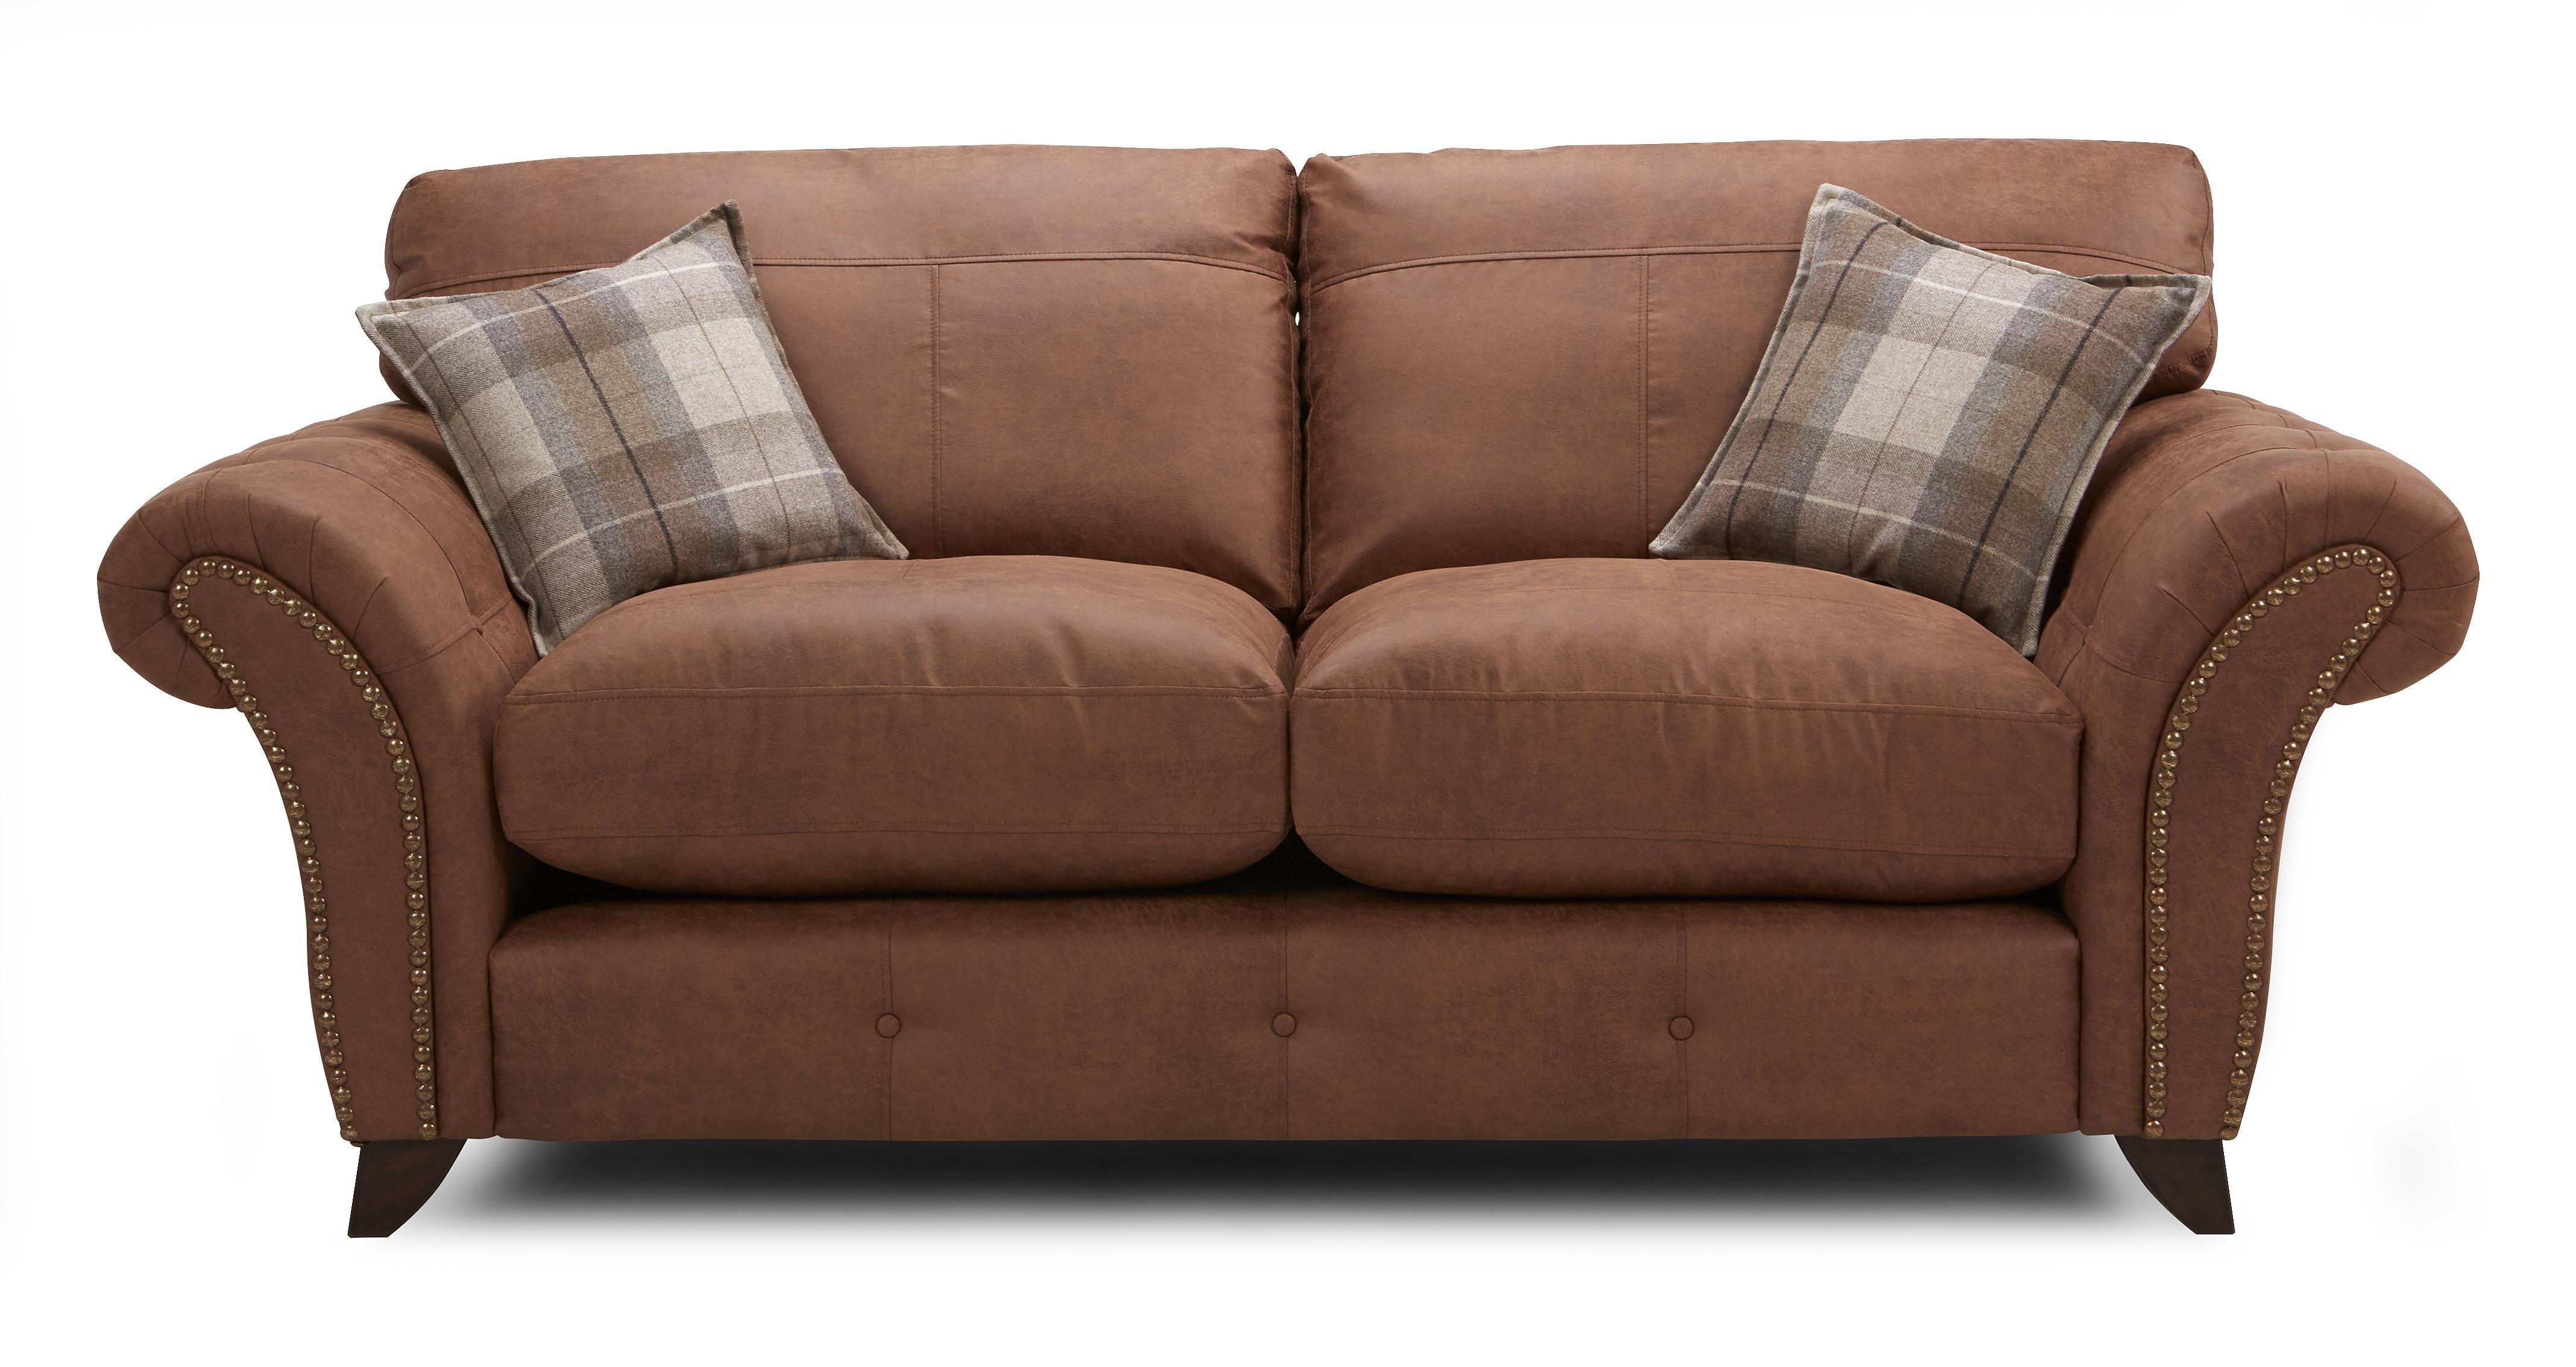 Fallon Clearance 4 Seater Sofa 2 Seater Sofa Accent Chair